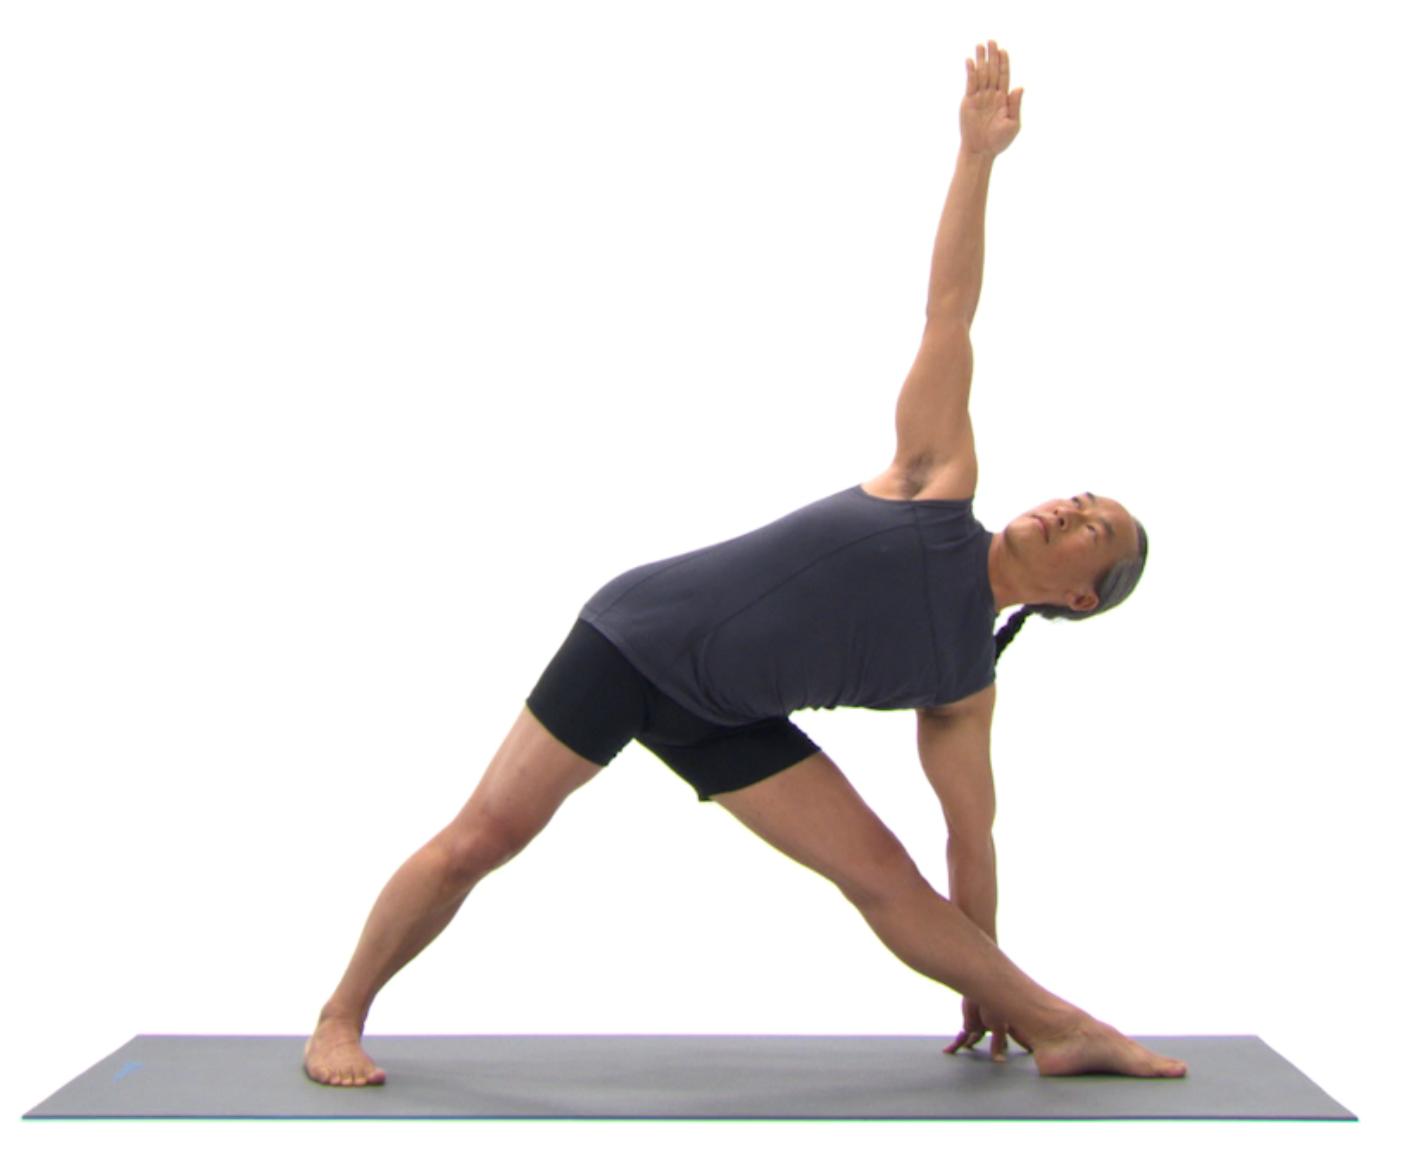 Discipline Your Body Through The Practice of Yoga Asana